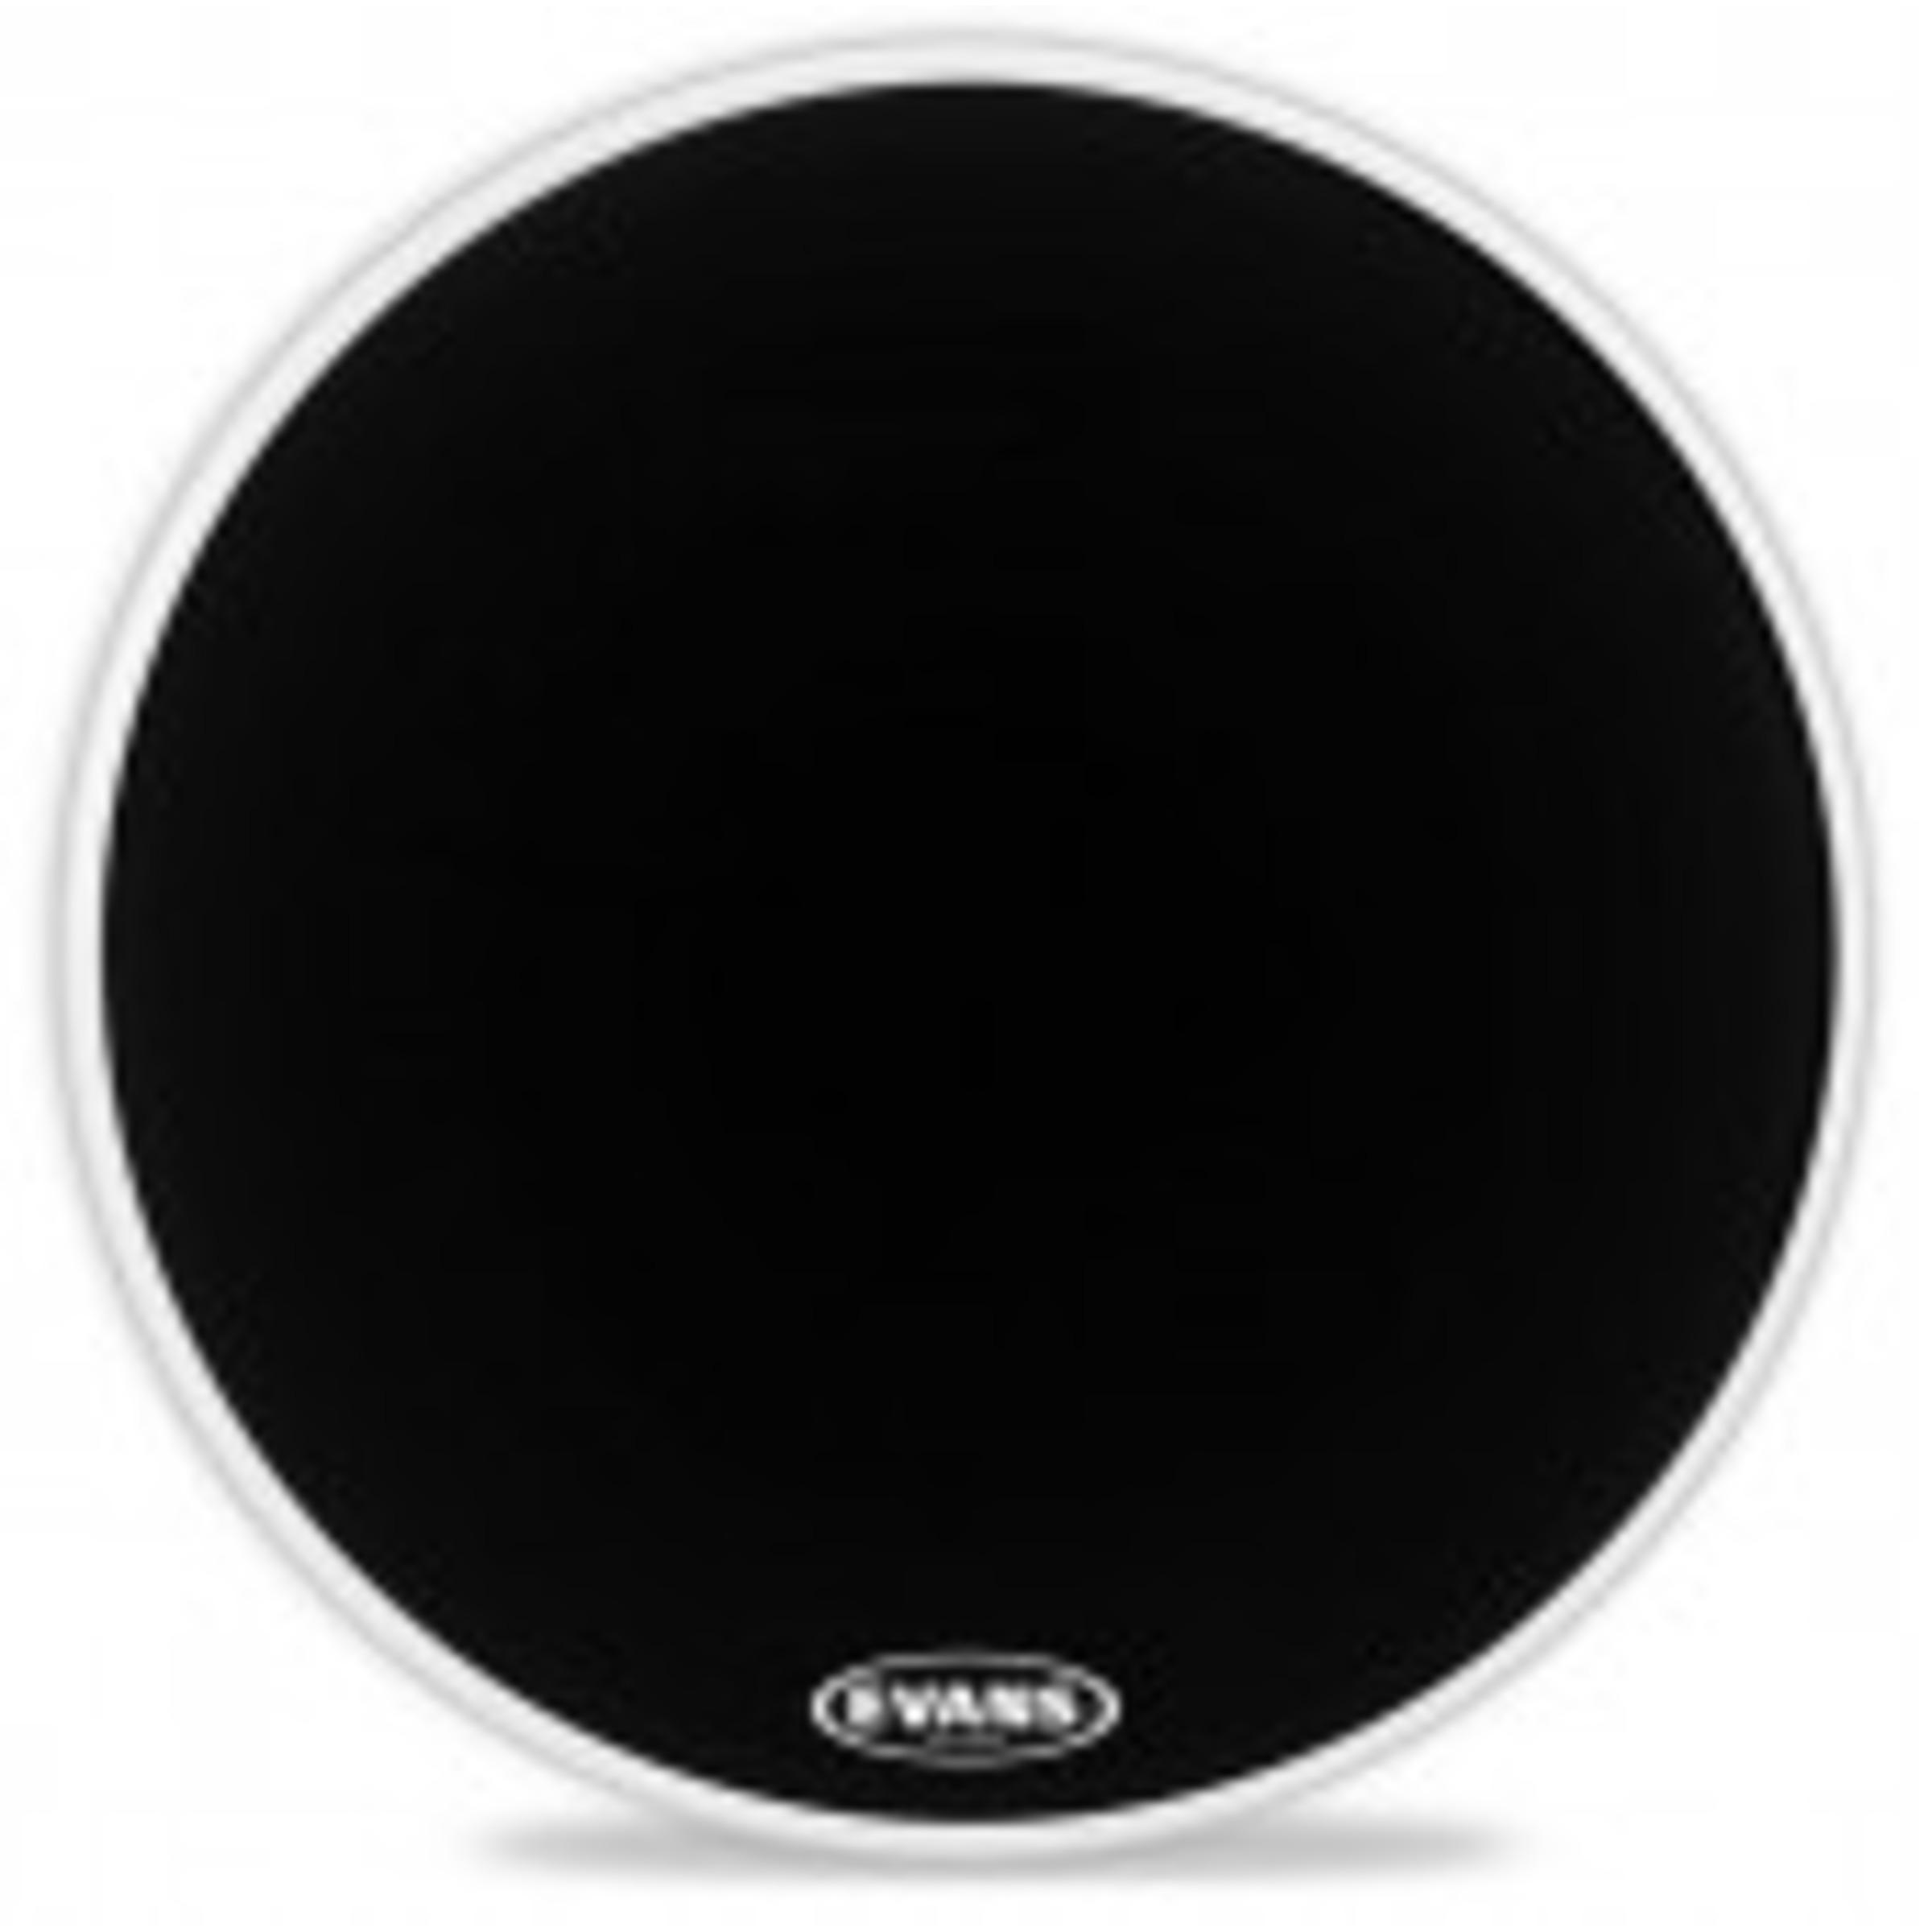 evans eq1 resonant black bass drum head giggear. Black Bedroom Furniture Sets. Home Design Ideas